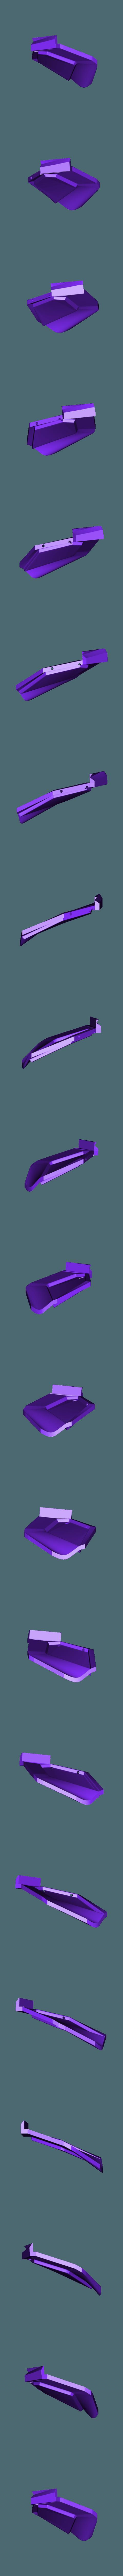 cheek left.stl Download STL file Iron Man Mark 42  • 3D printing object, SKUPERDIY